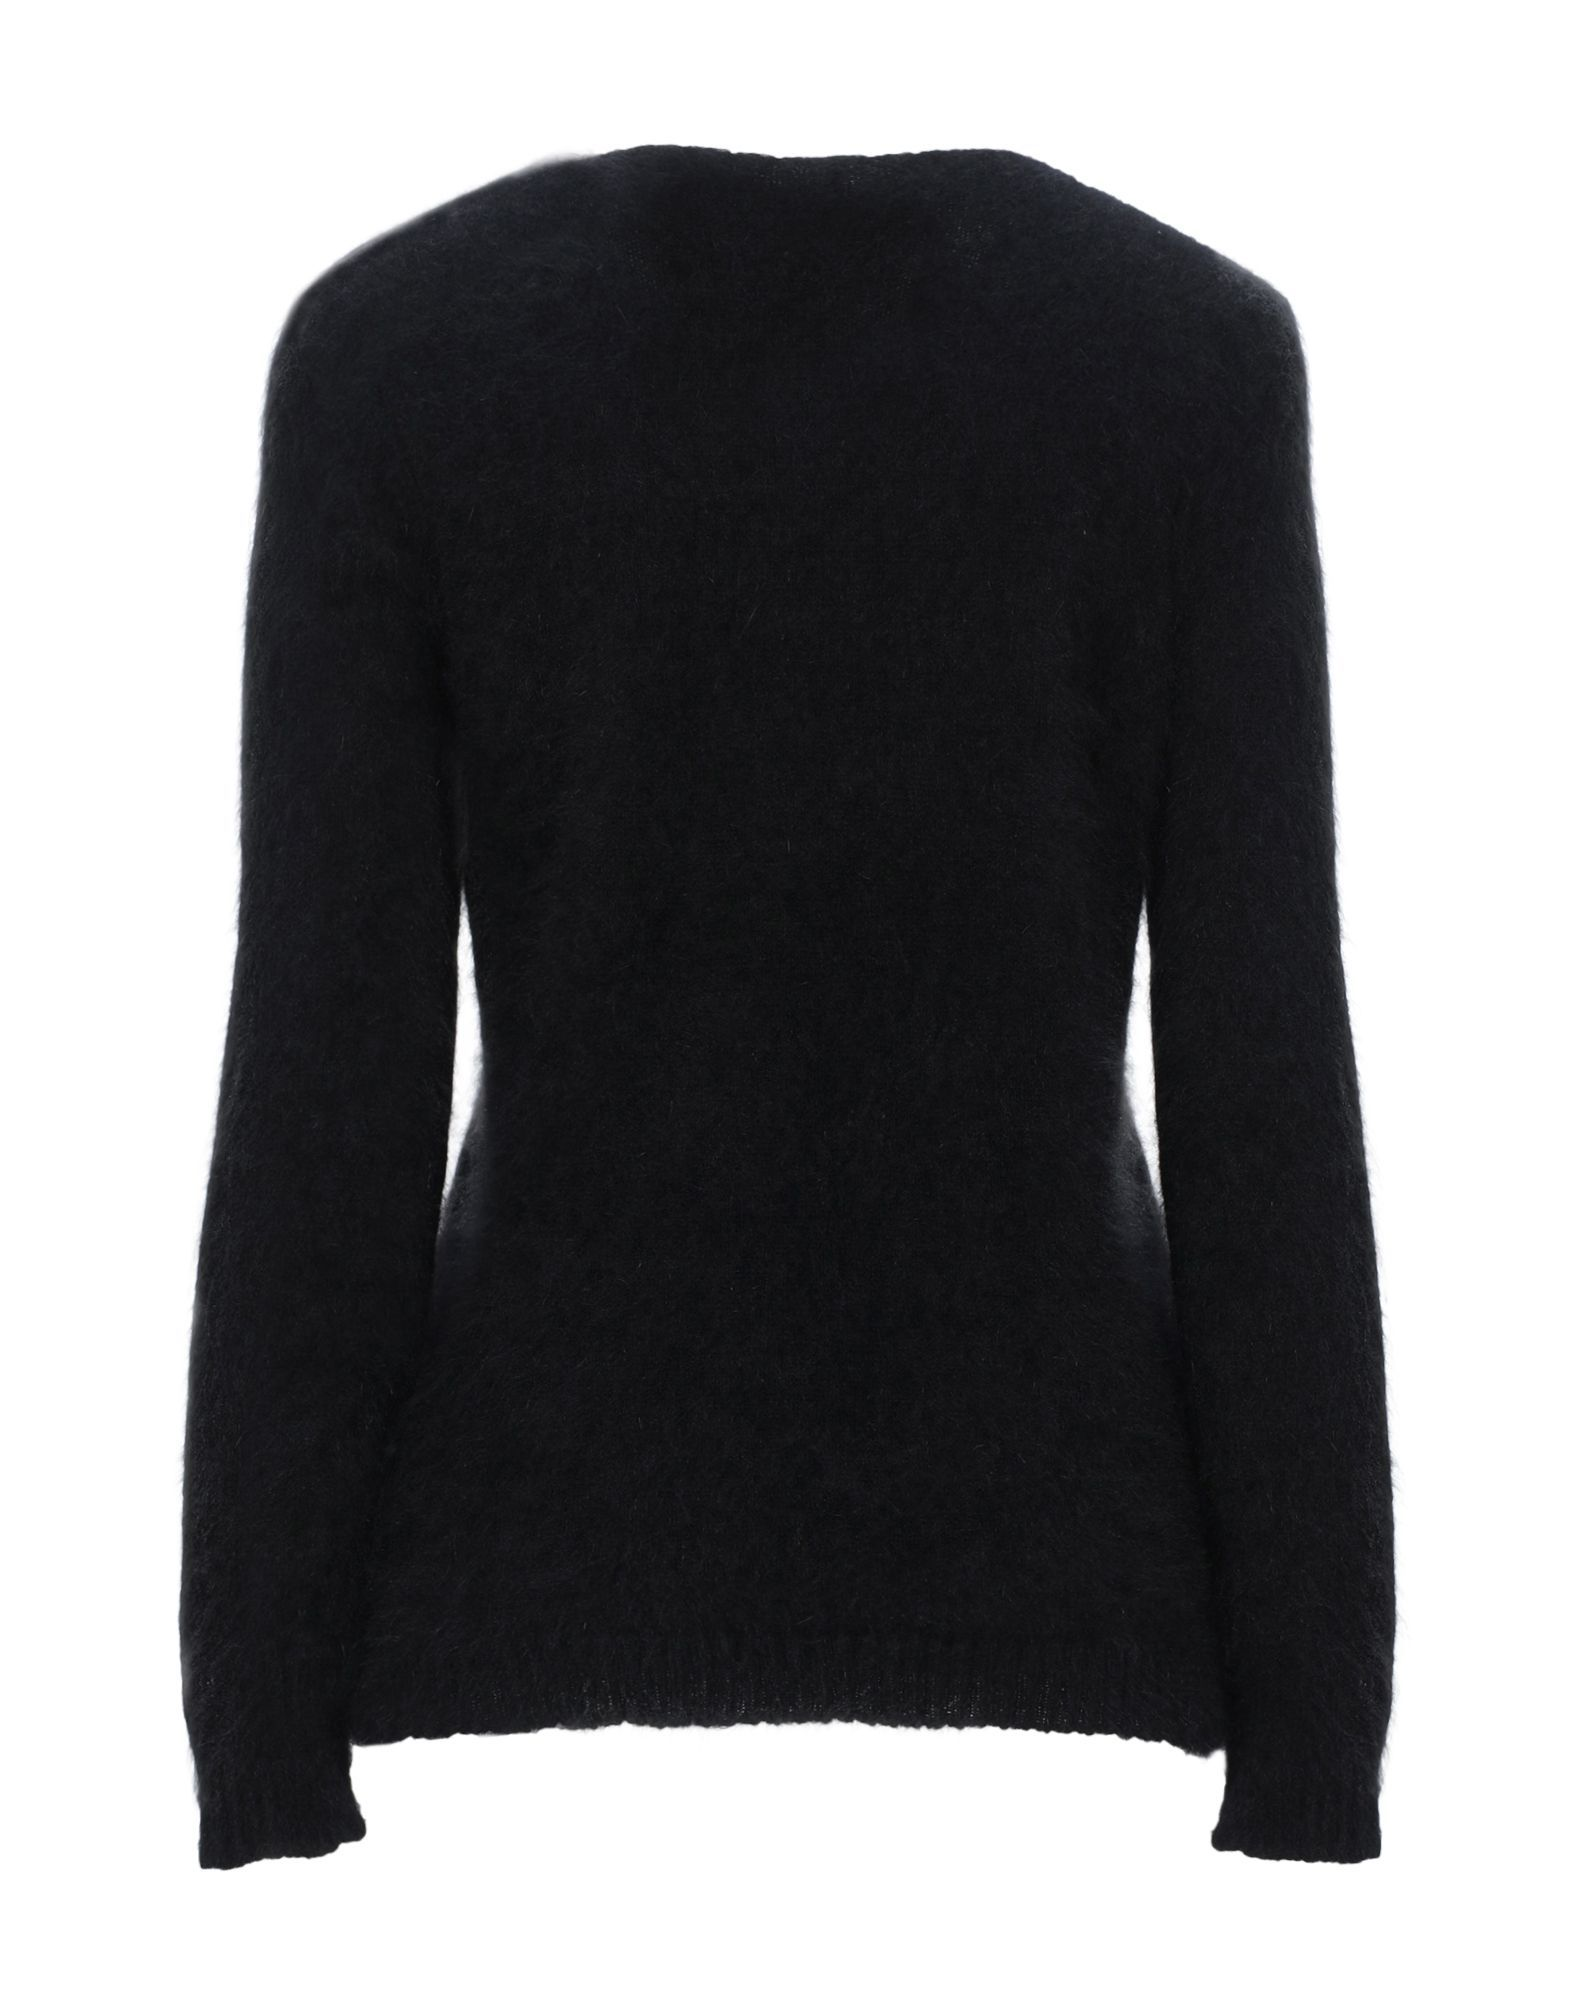 No21 Black Angora Knit Embroidered Jumper